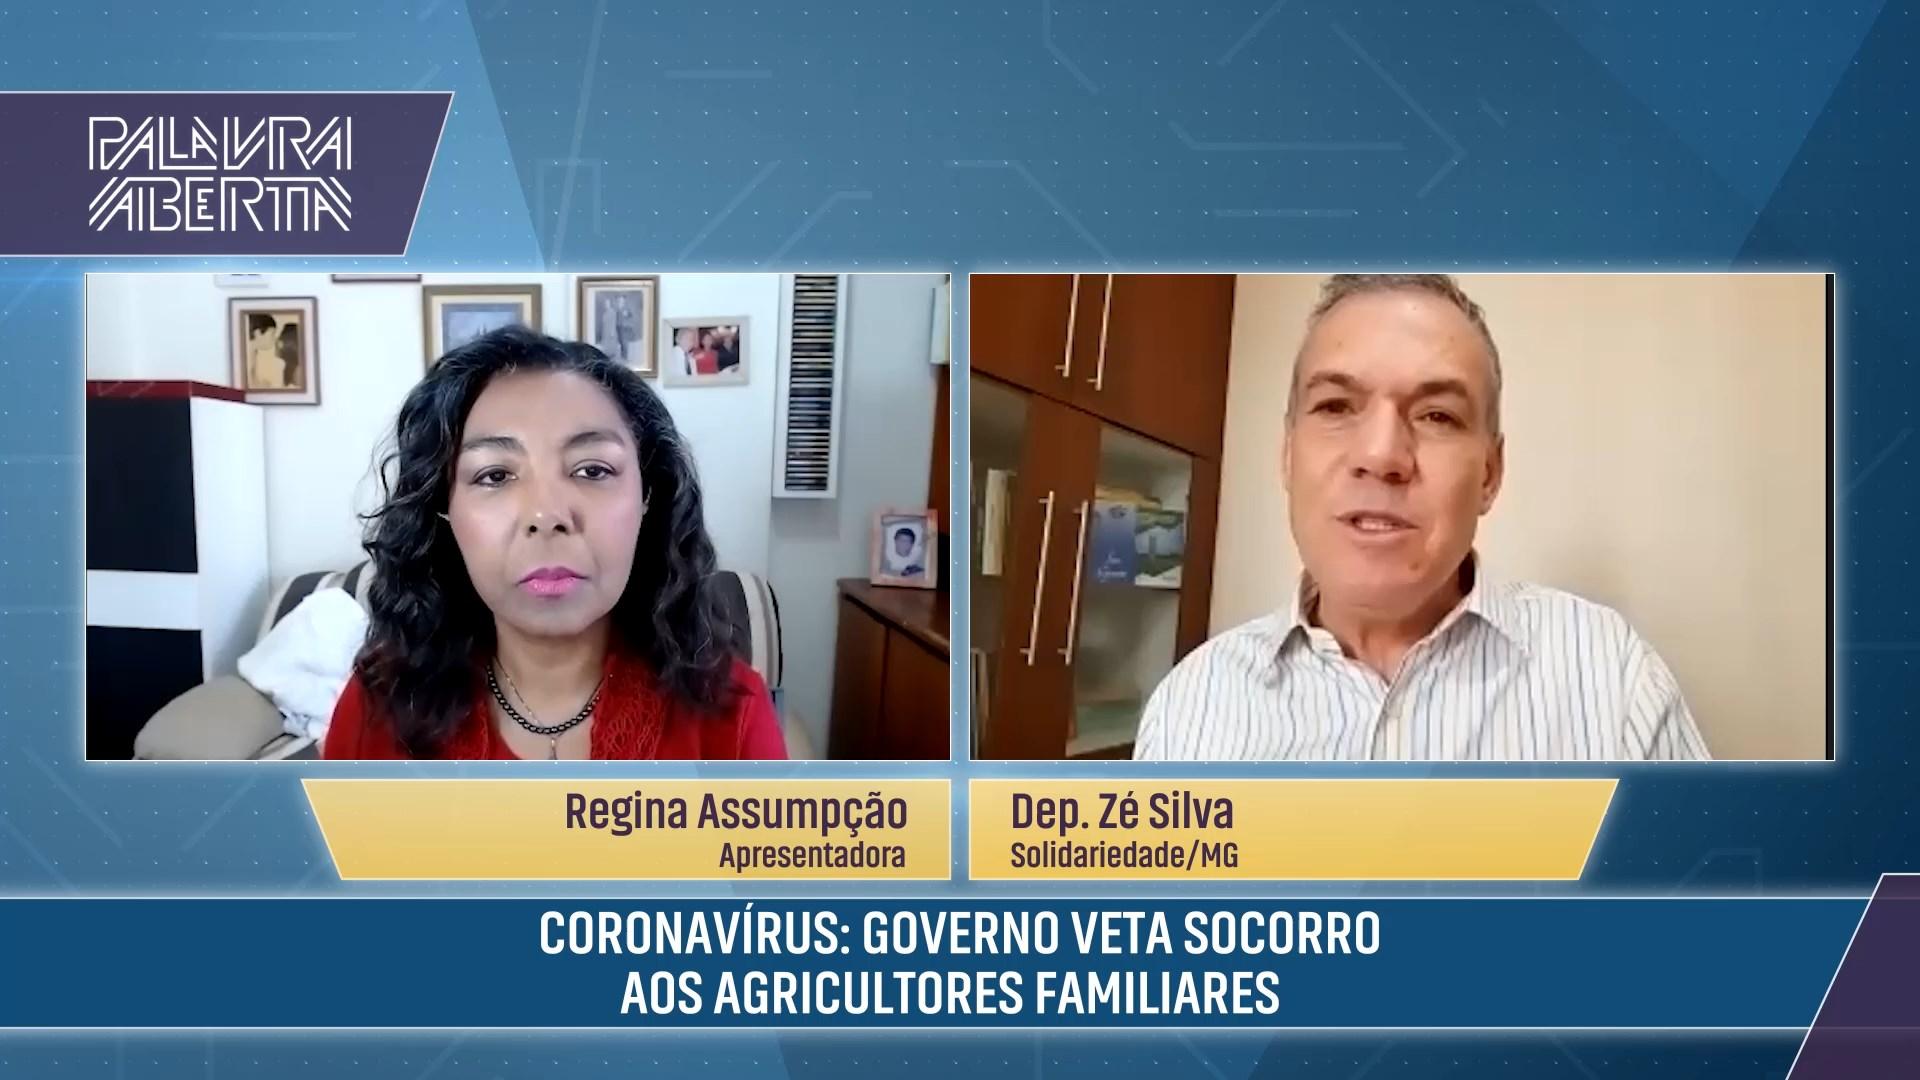 Coronavírus: governo veta socorro aos agricultores familiares